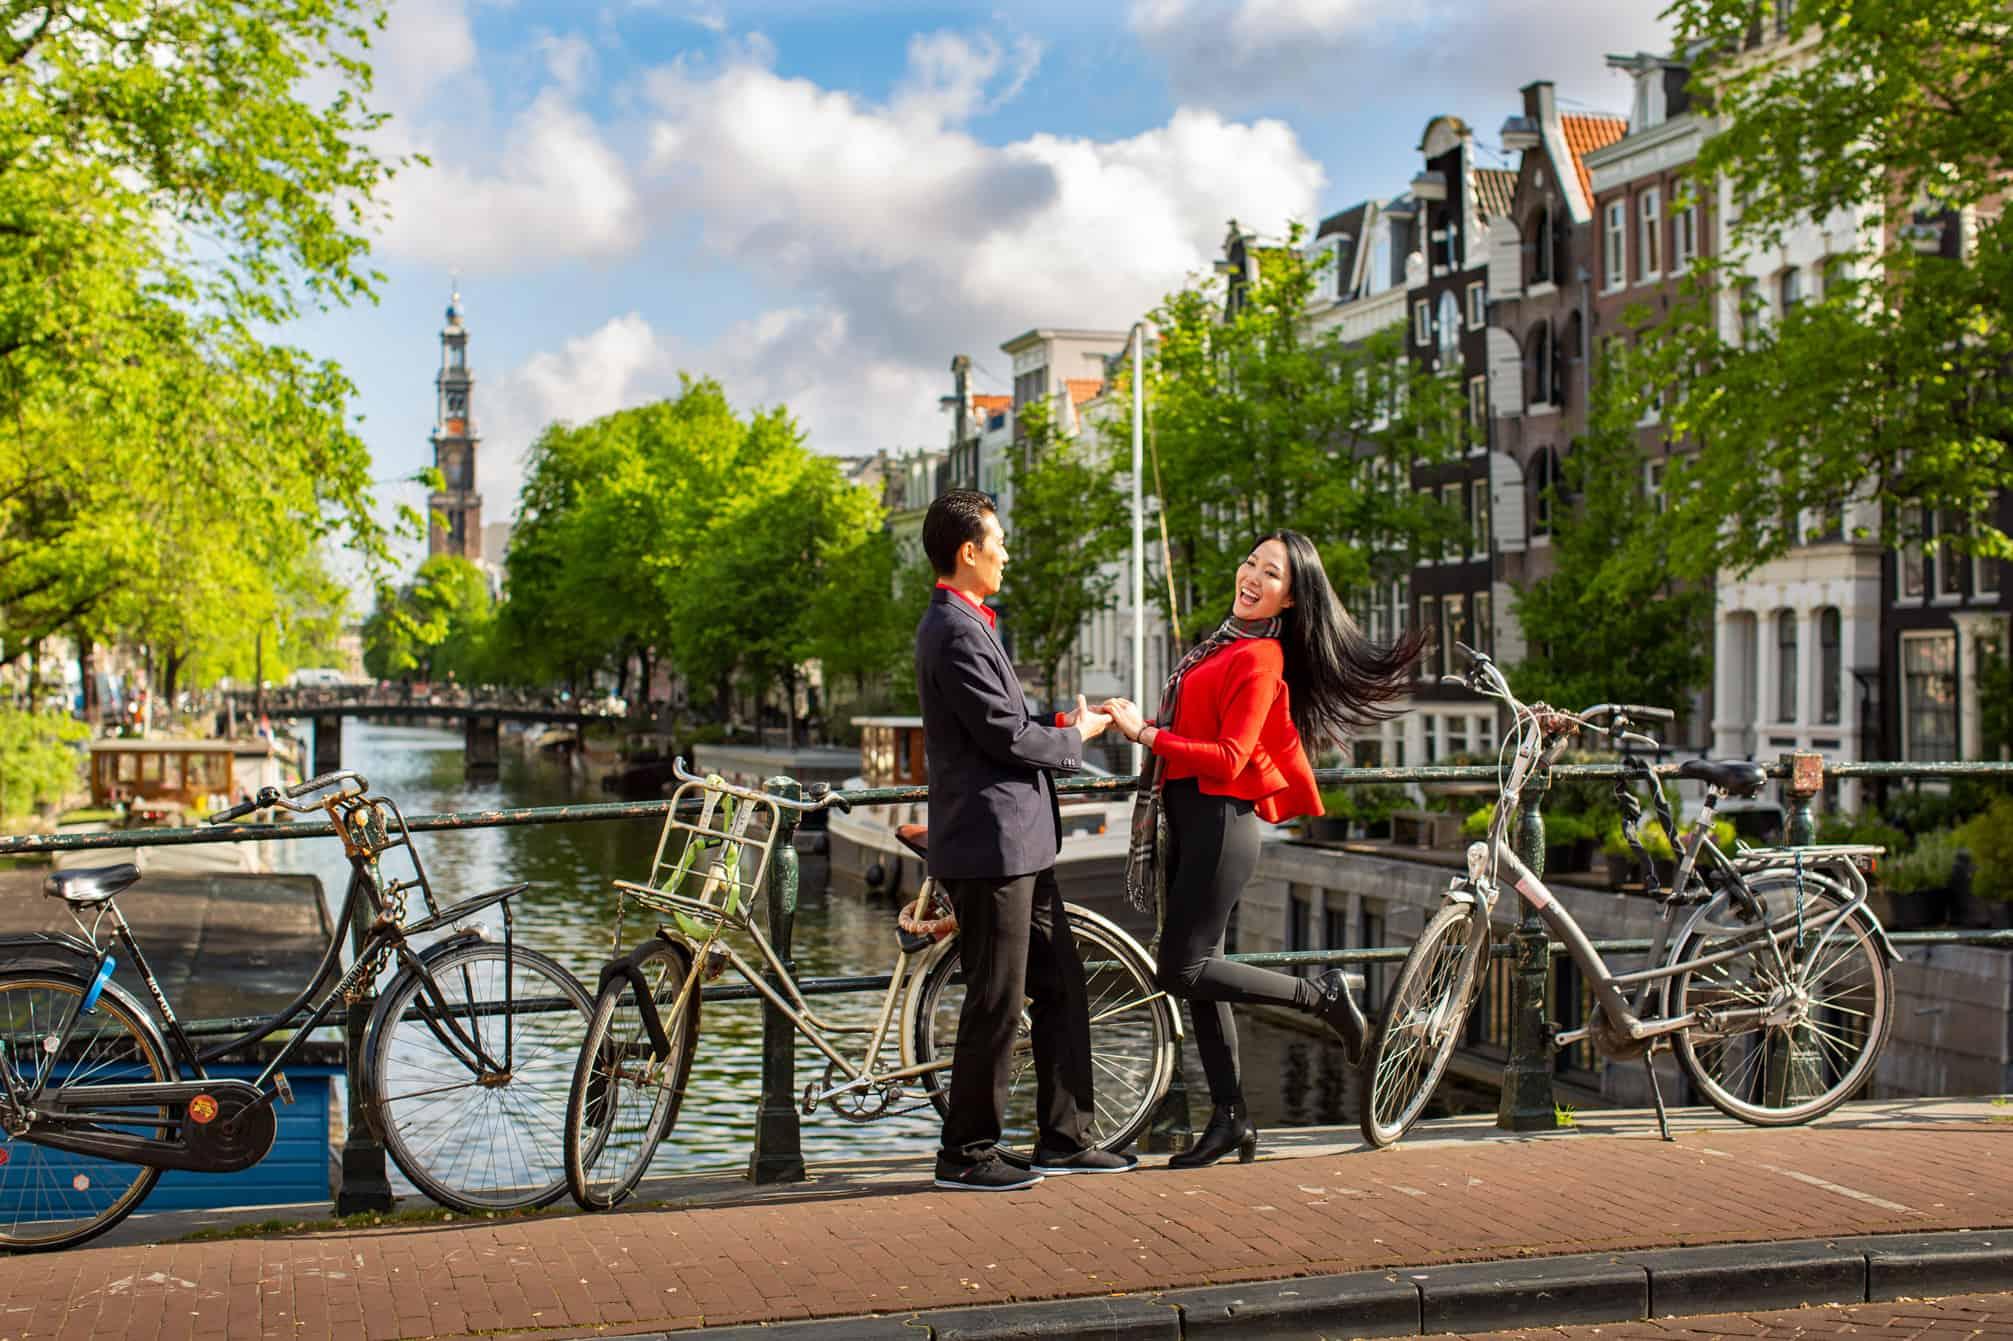 Loveshoot fotoshoot in Amsterdam.